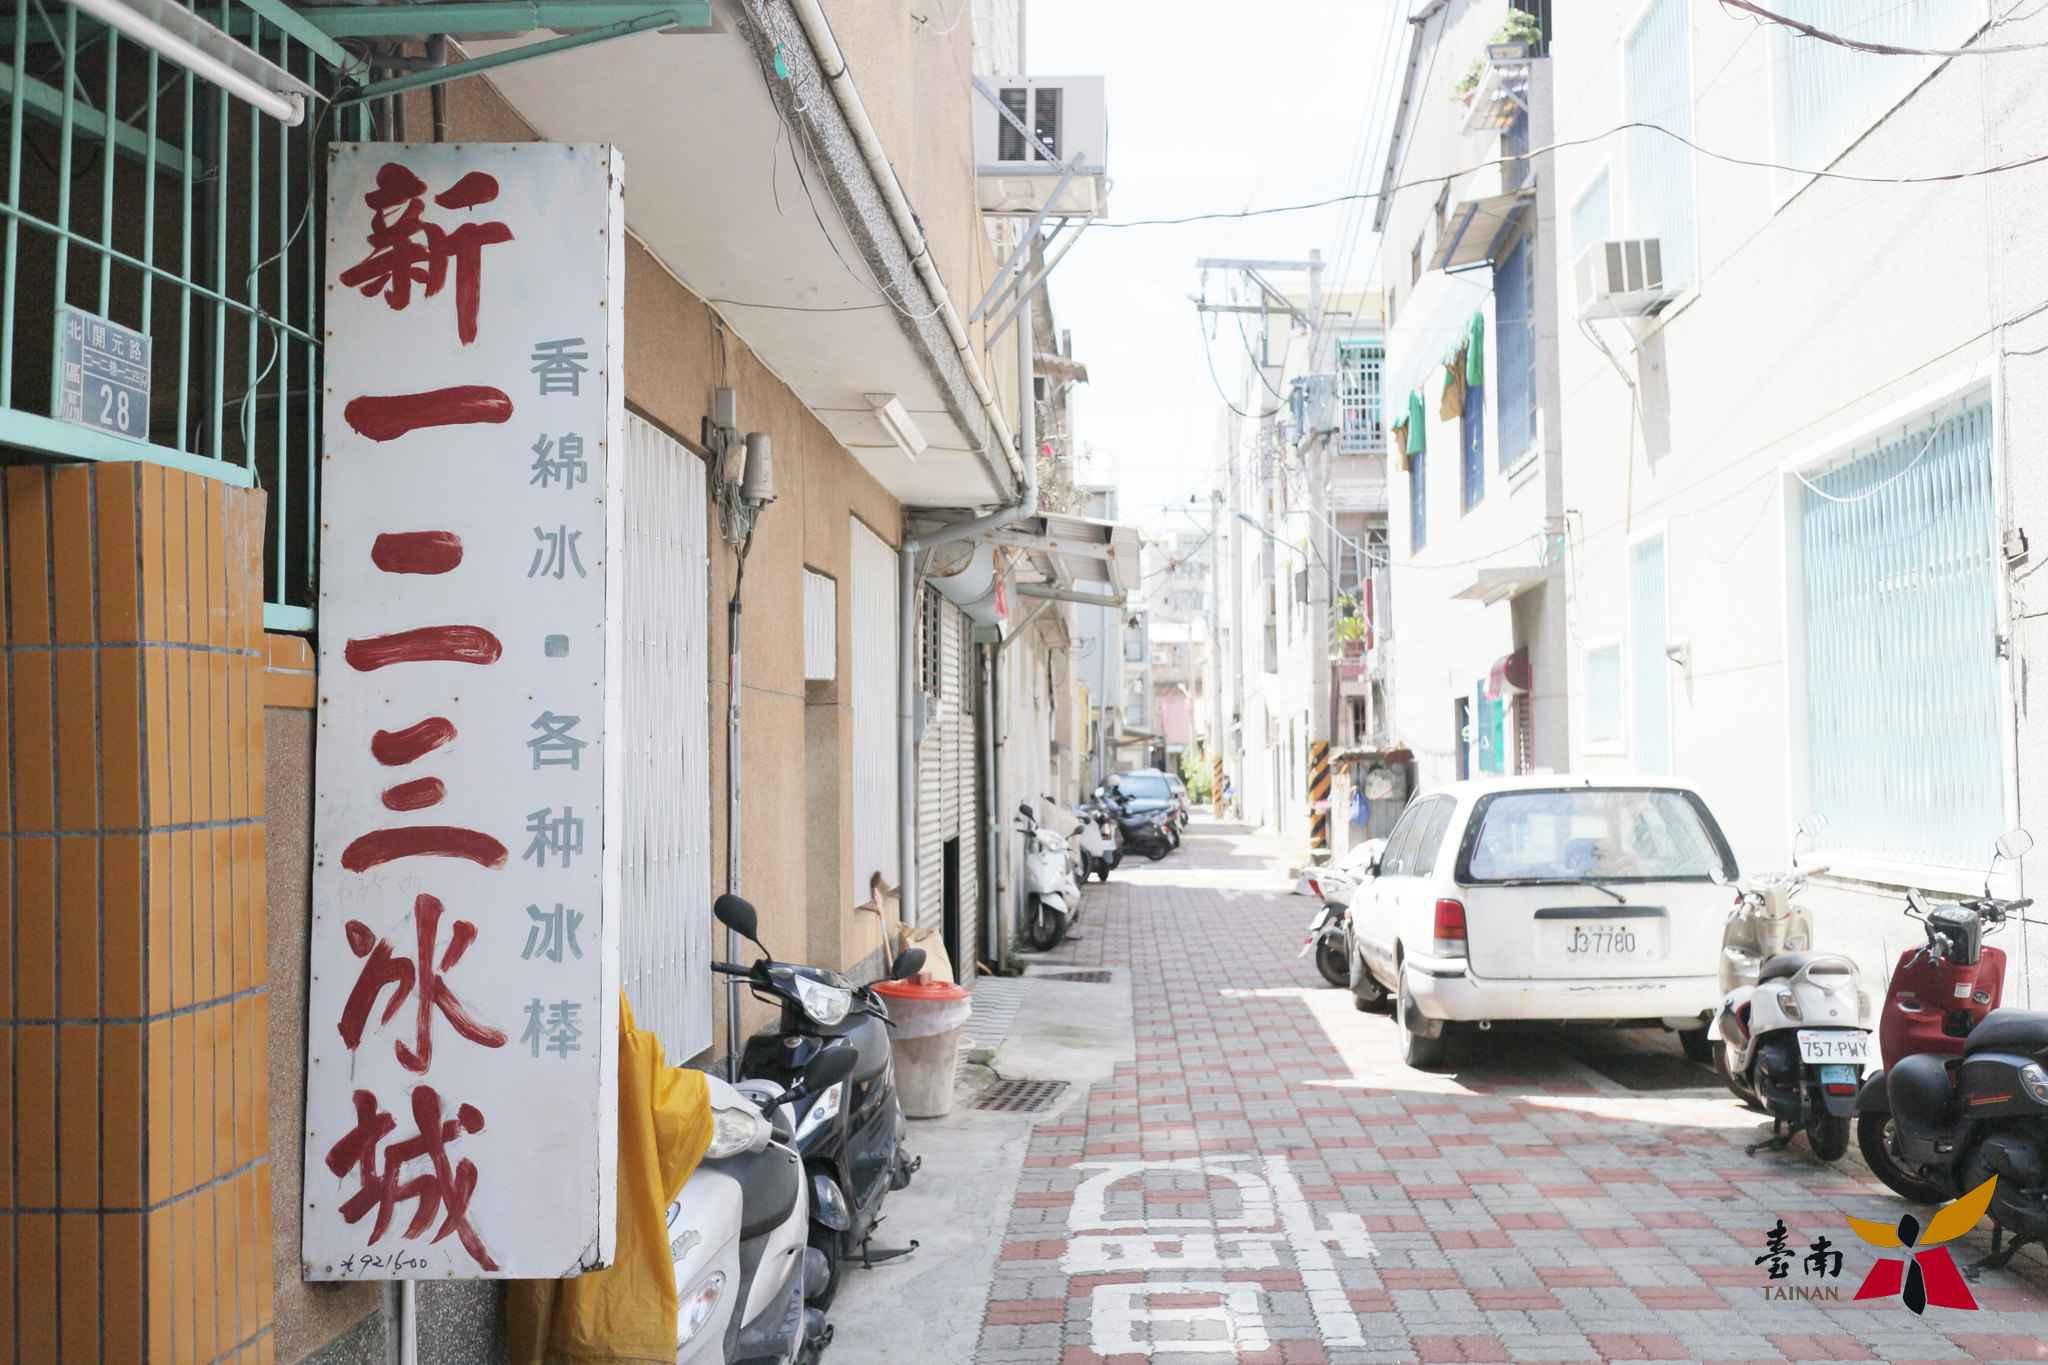 台南冰店- Mytainan - 14